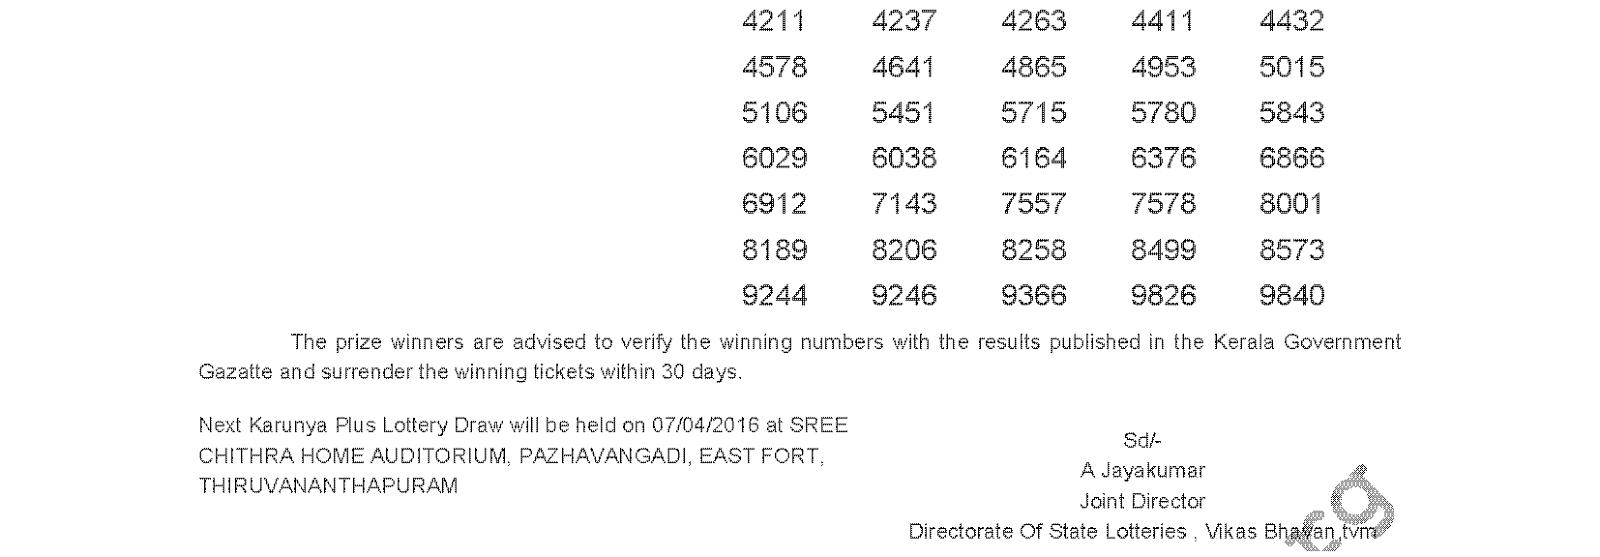 KARUNYA PLUS Lottery KN 103 Result 31-3-2016